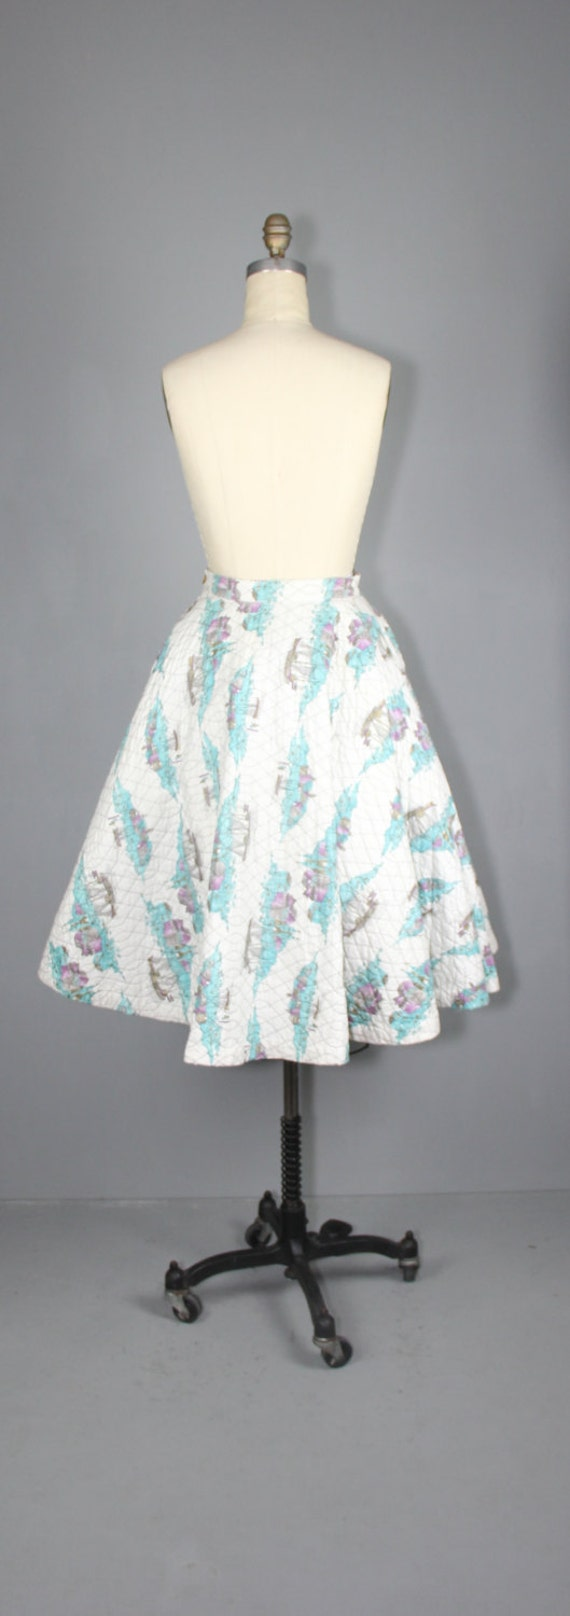 1950s skirt / circle skirt / novelty print / COAS… - image 5